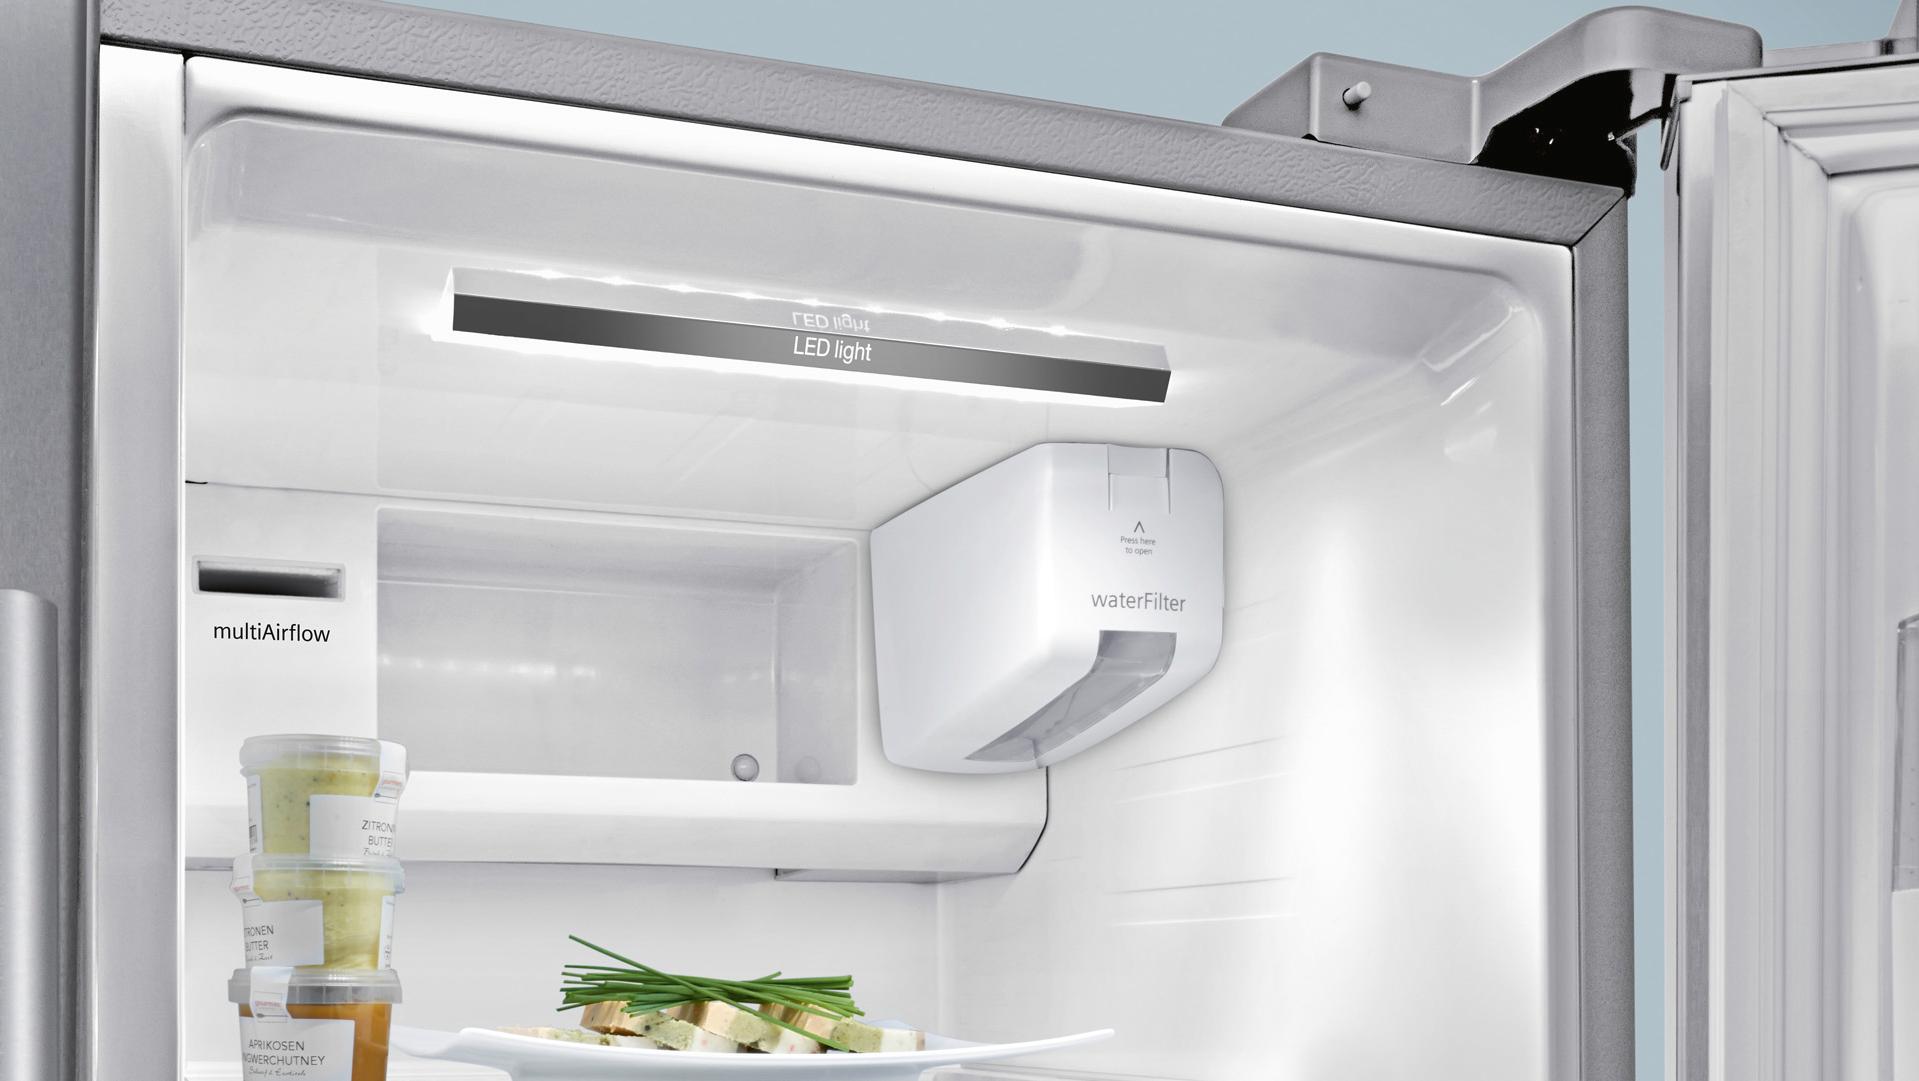 Siemens Kühlschrank Rollen : Side by side kühlschrank siemens electrogeräte gmbh ka90dvi20 küche&co